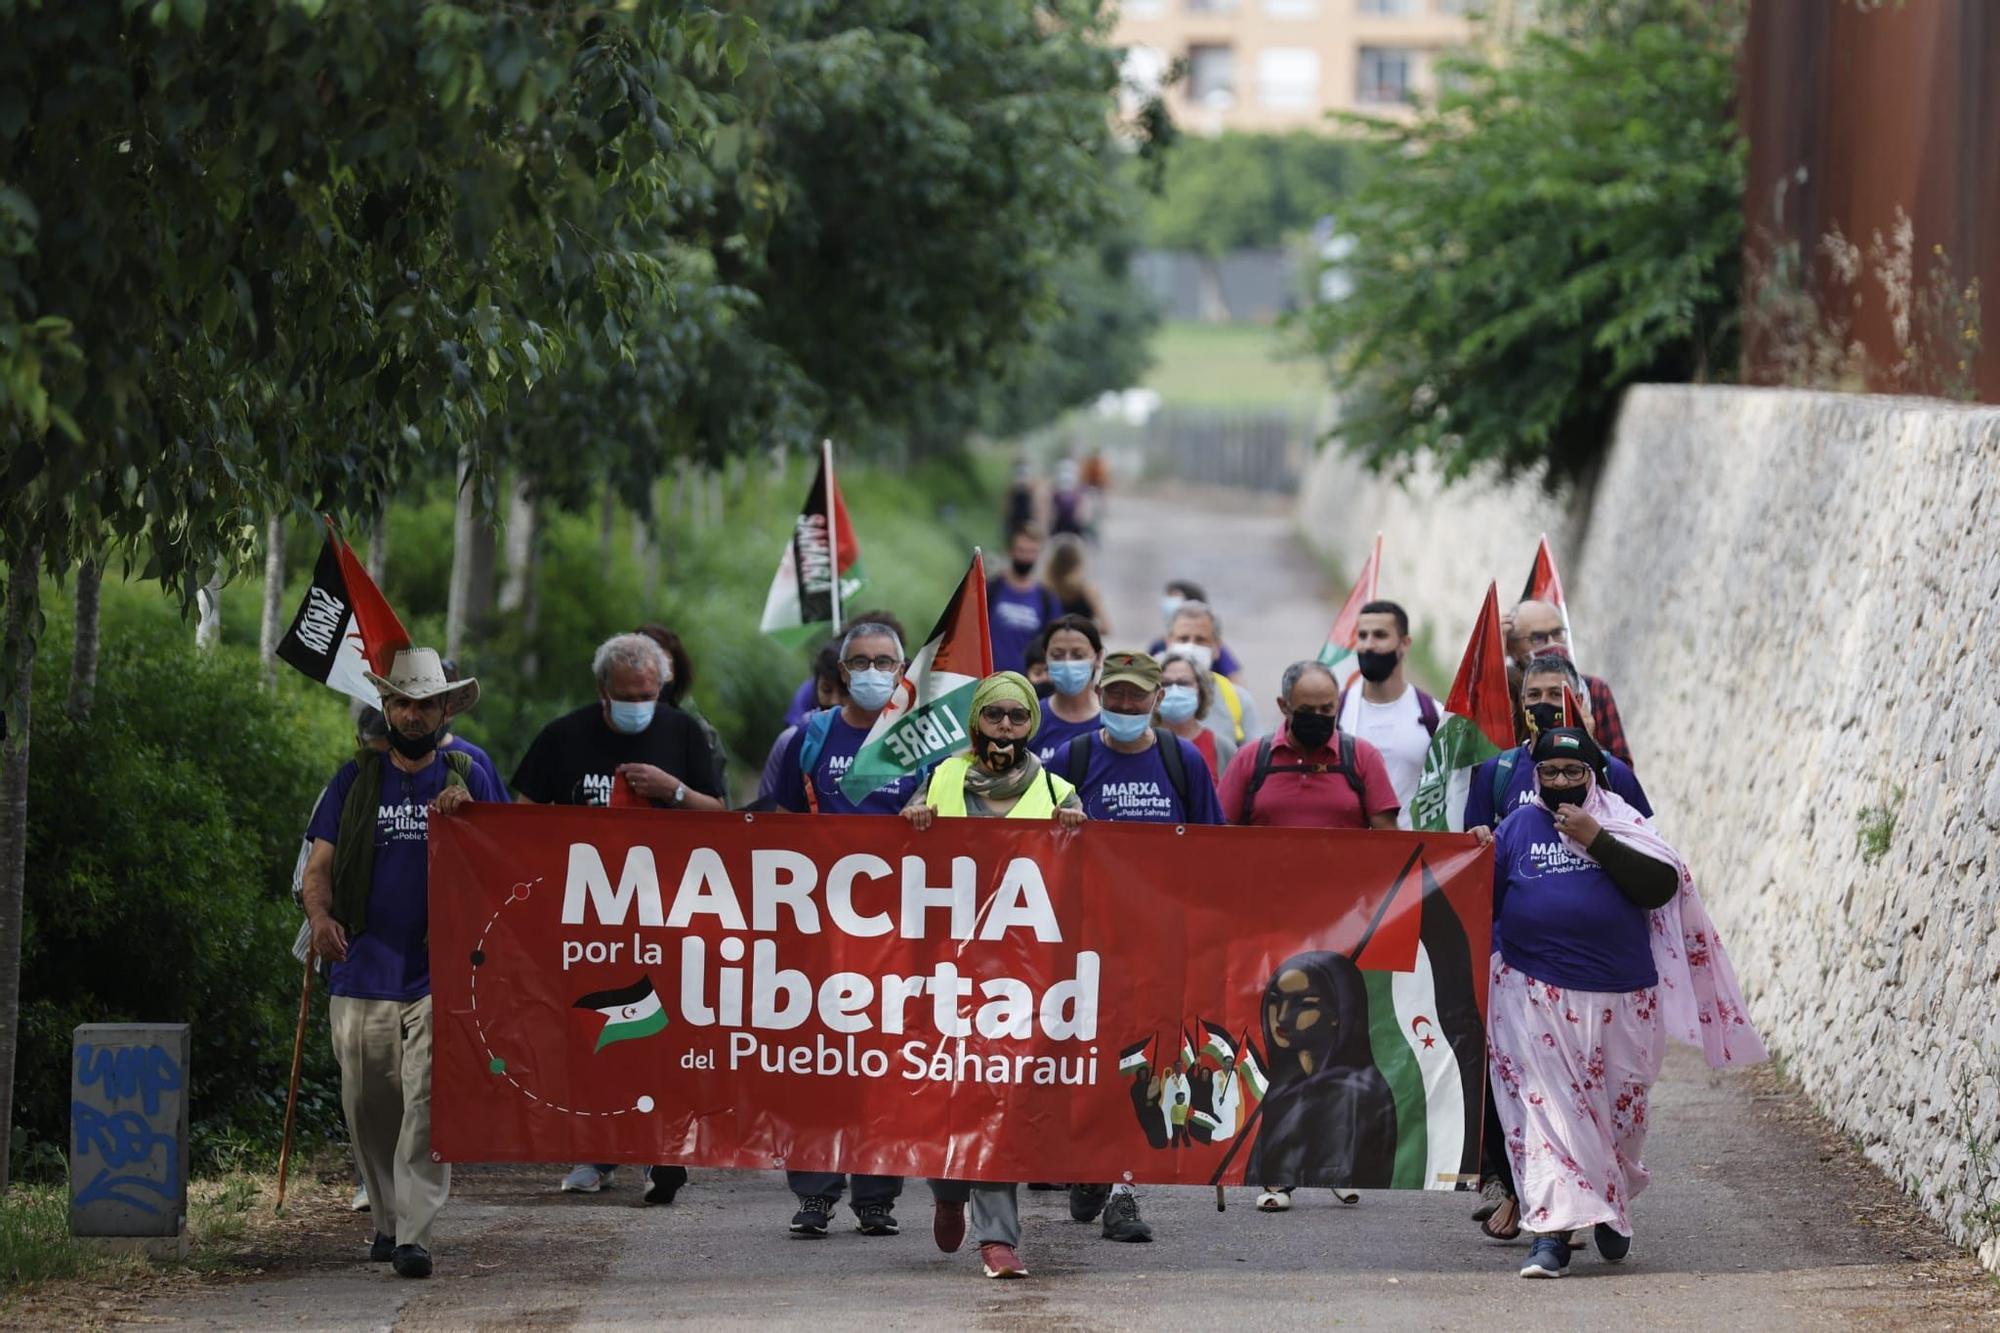 Sale de València la marcha que reclama la libertad de pueblo saharaui